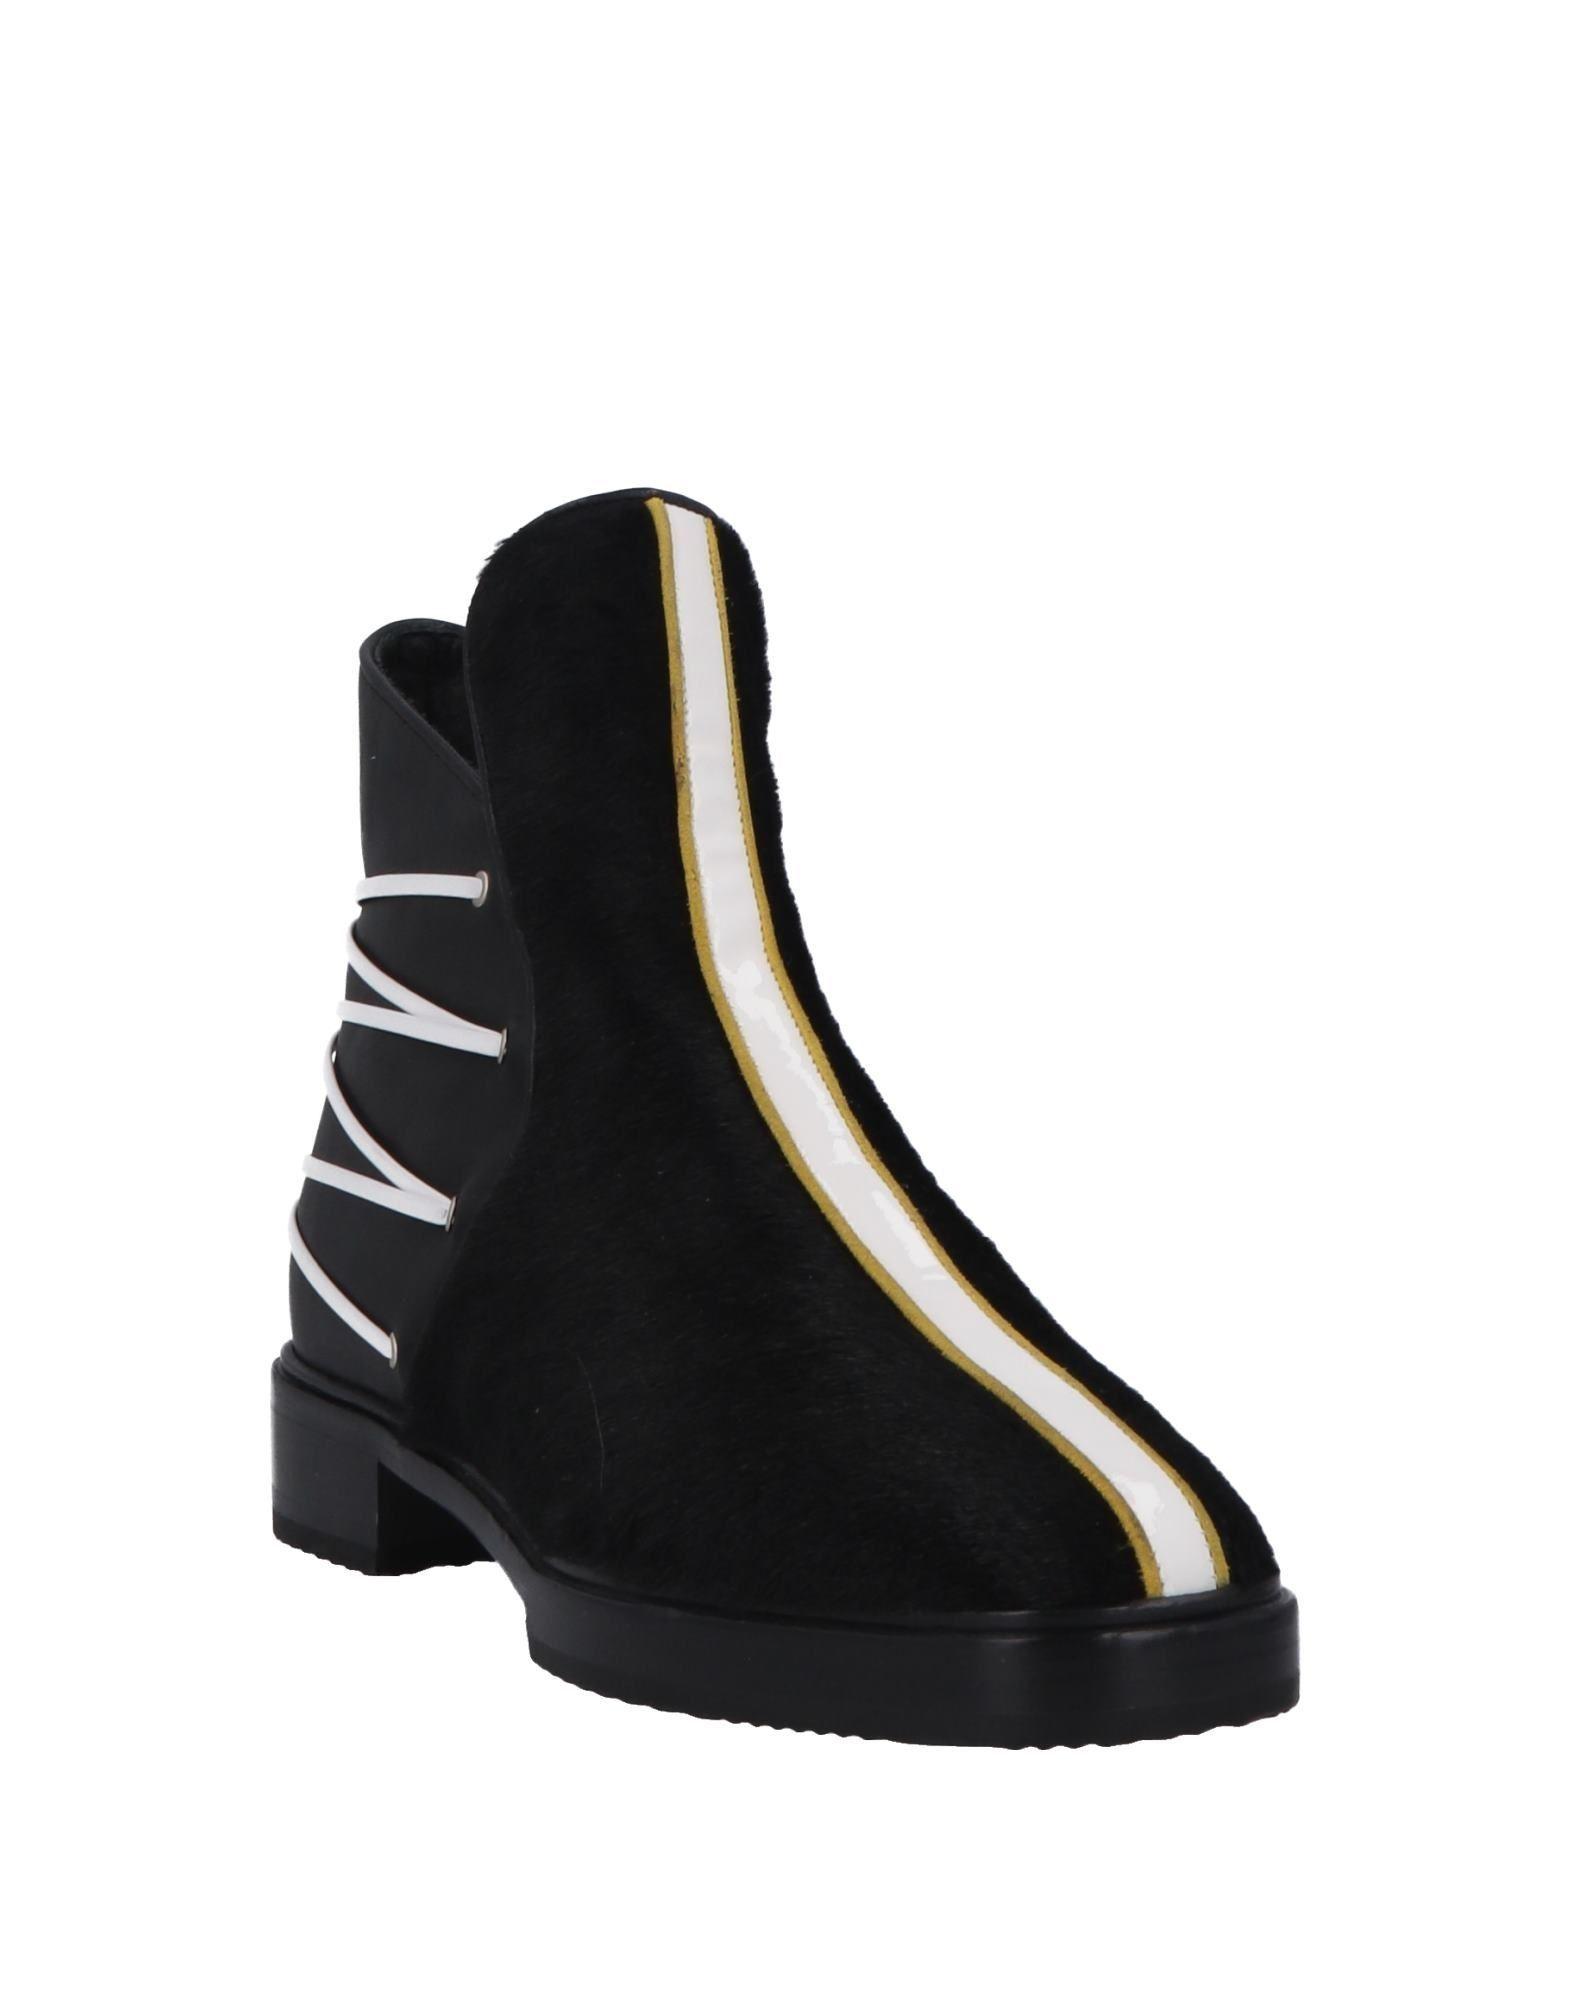 Racine Carrée Women's Ankle Boots Black Leather